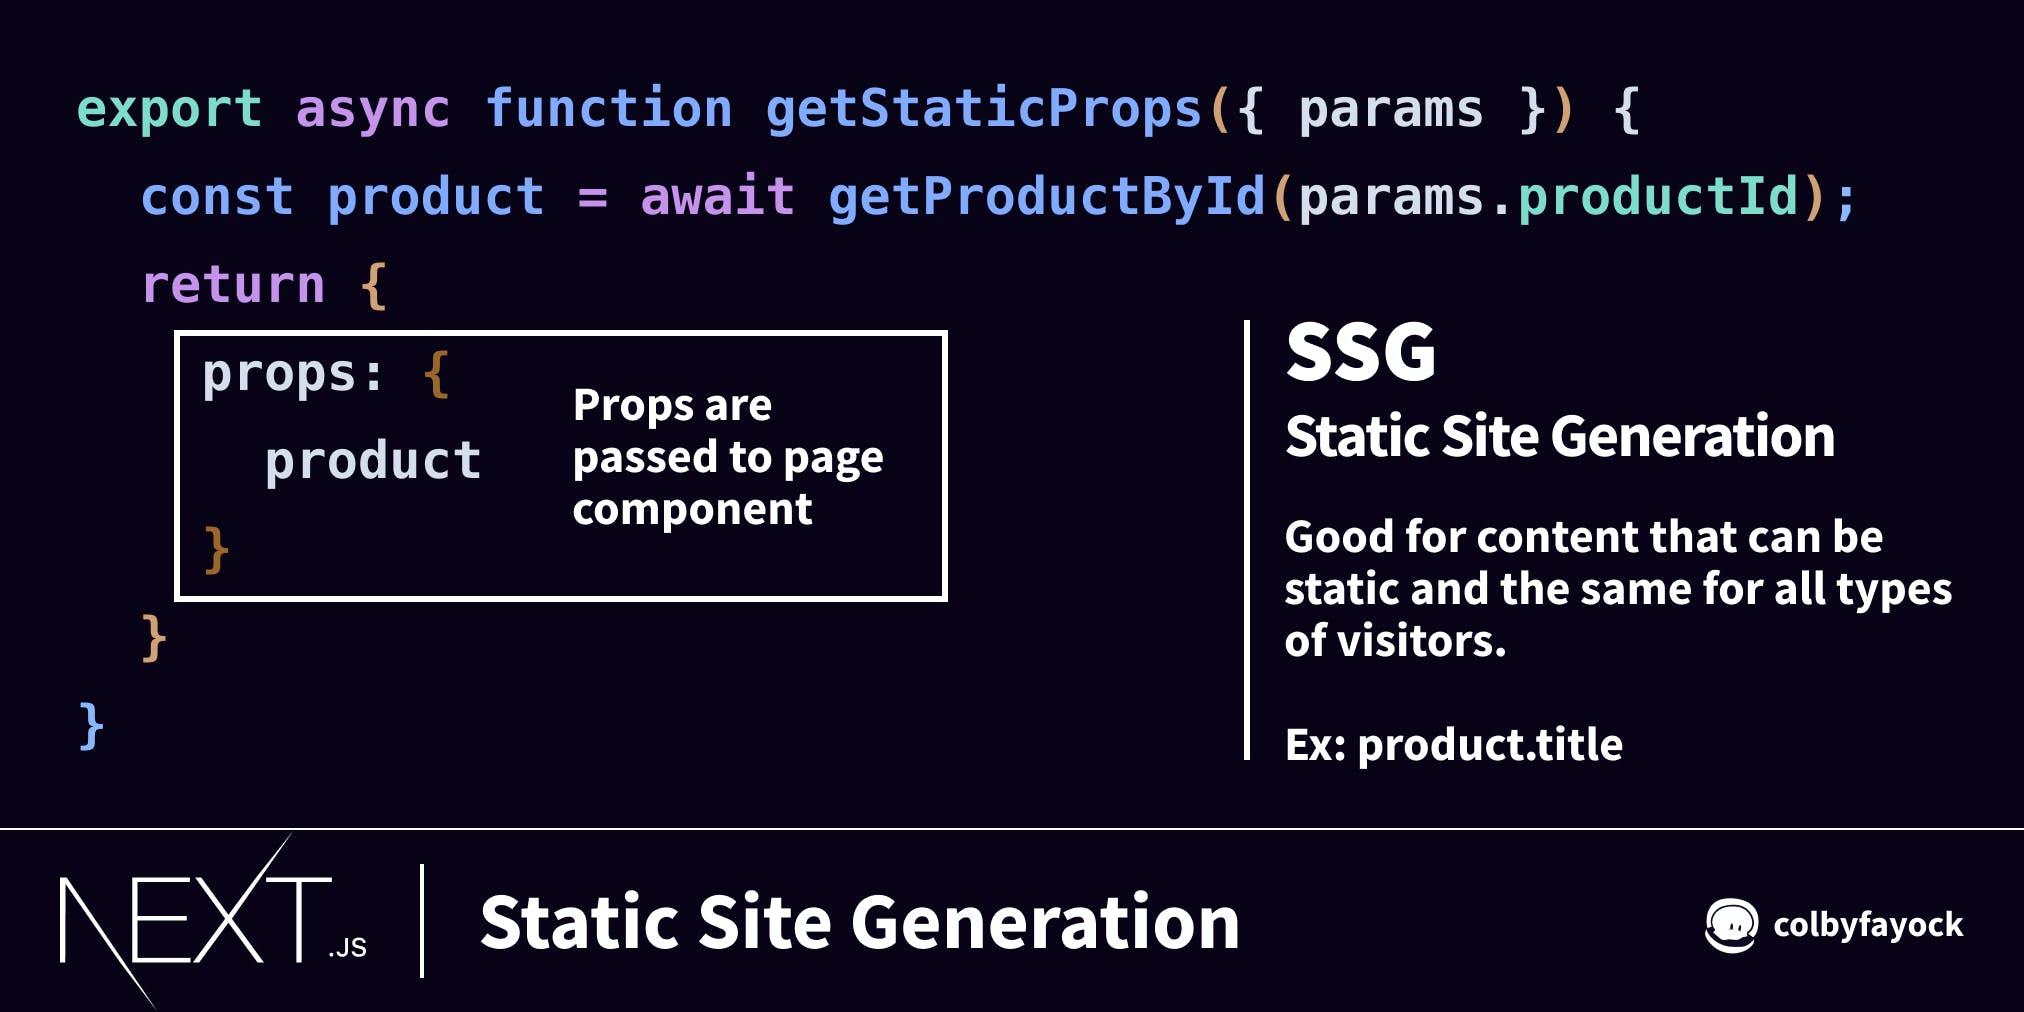 Static Site Generation